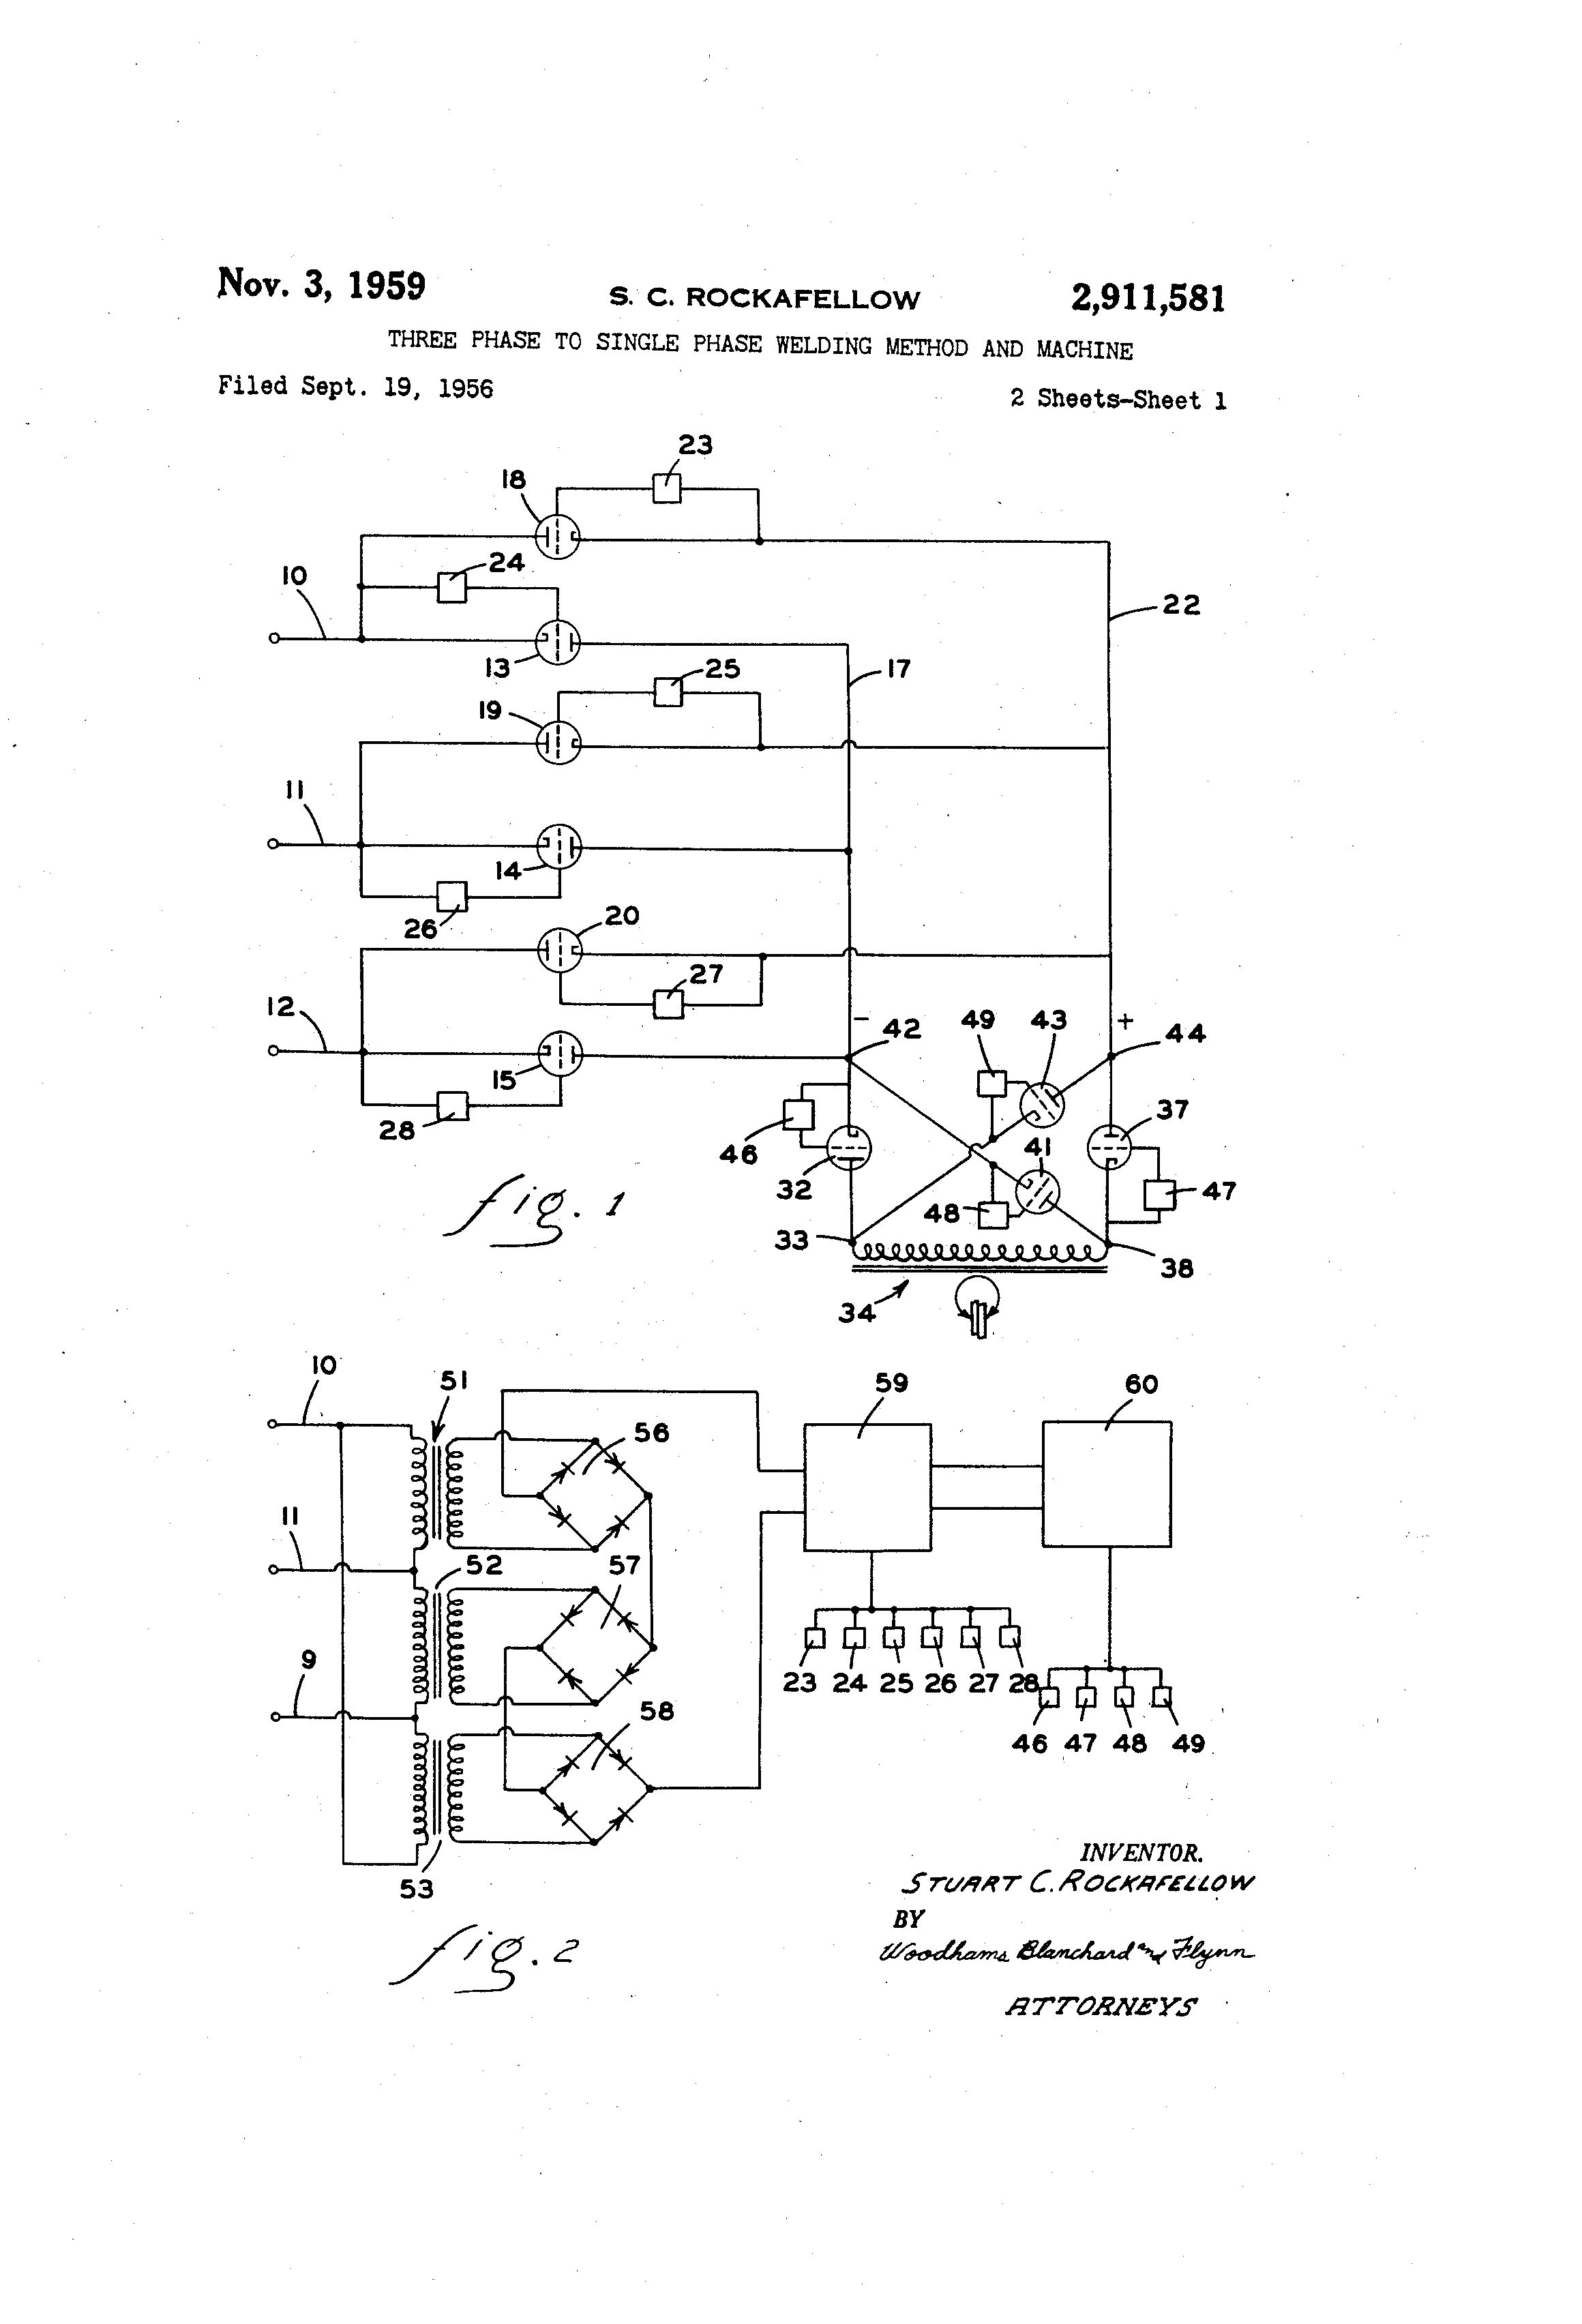 Welding Transformer Winding Diagram Trusted Schematics Machine Patent Us2911581 Three Phase To Single Method And Wind Generator